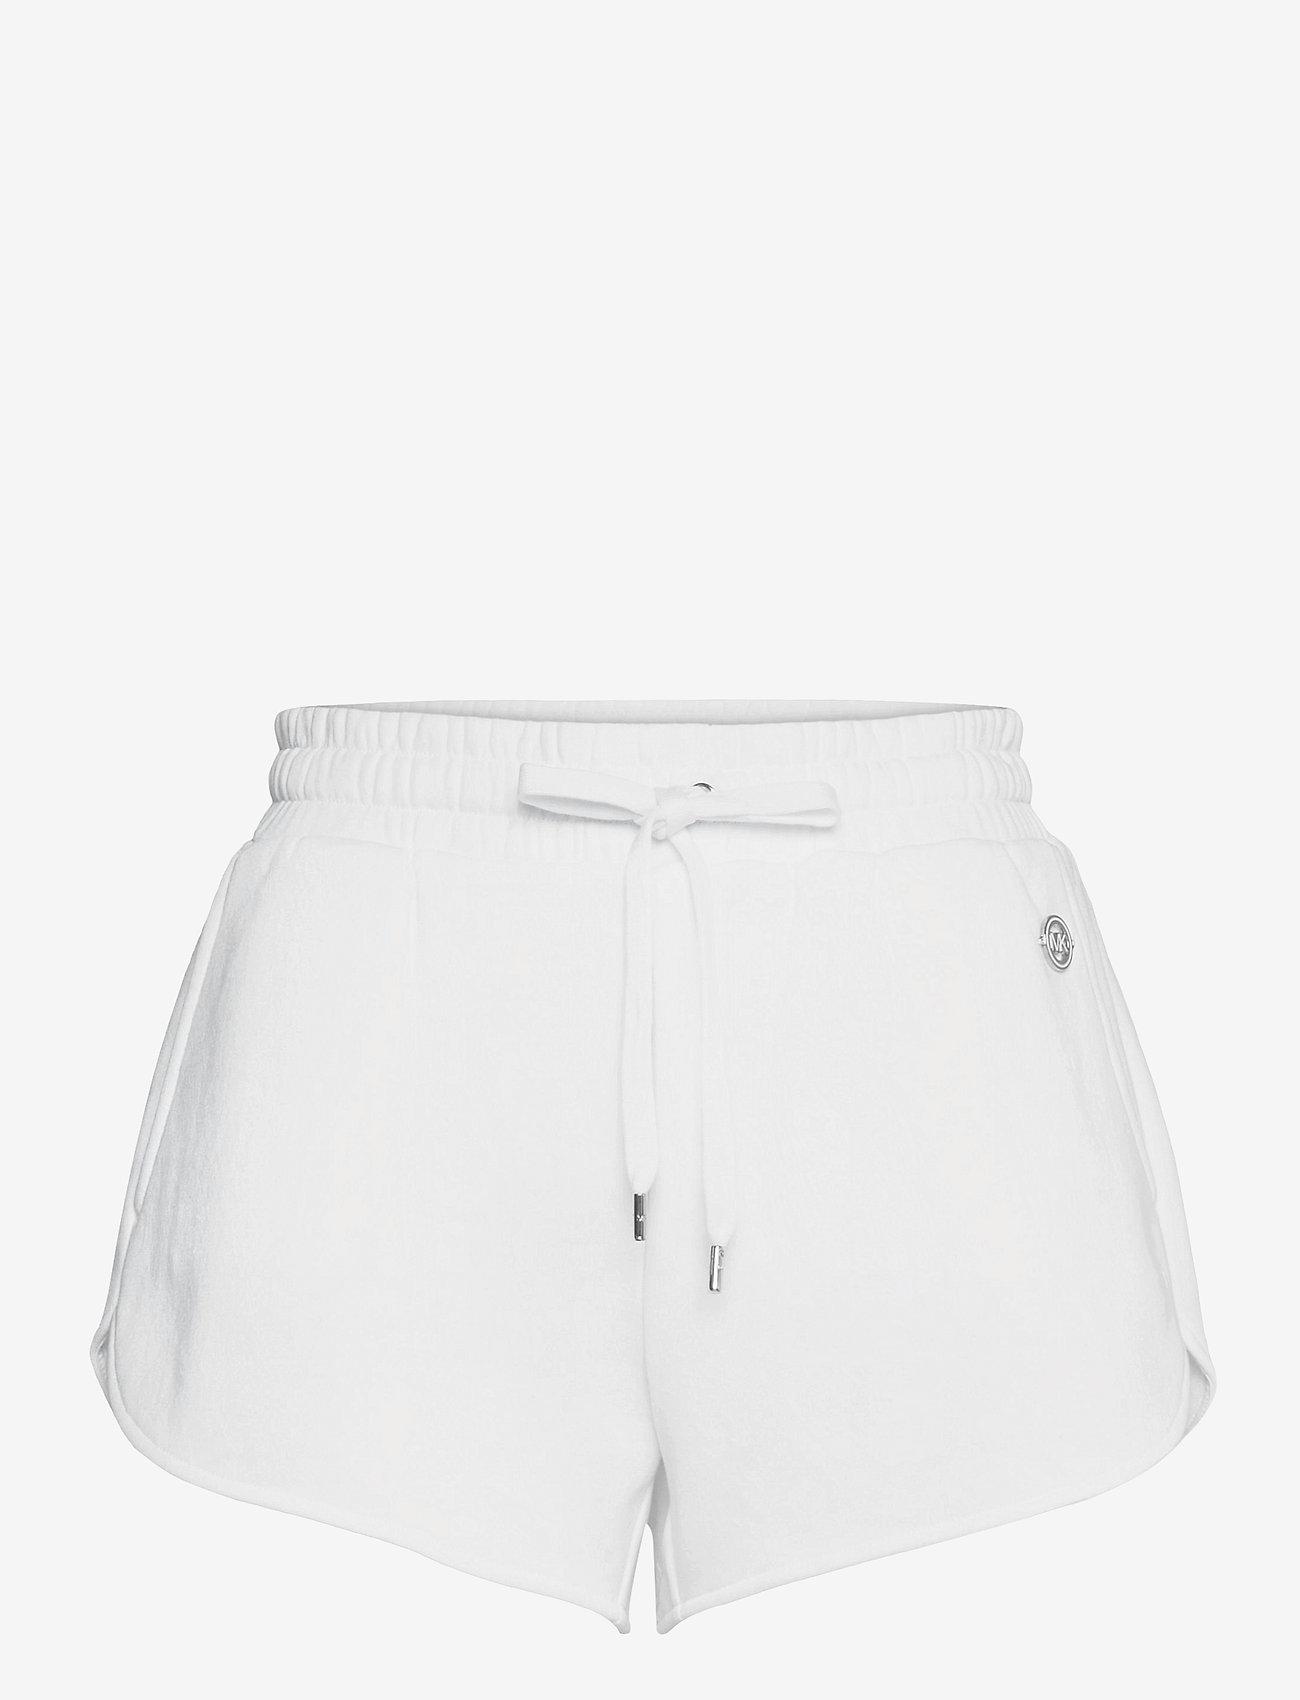 Michael Kors - CLASSIC SPORT SHORT - casual shorts - white - 0